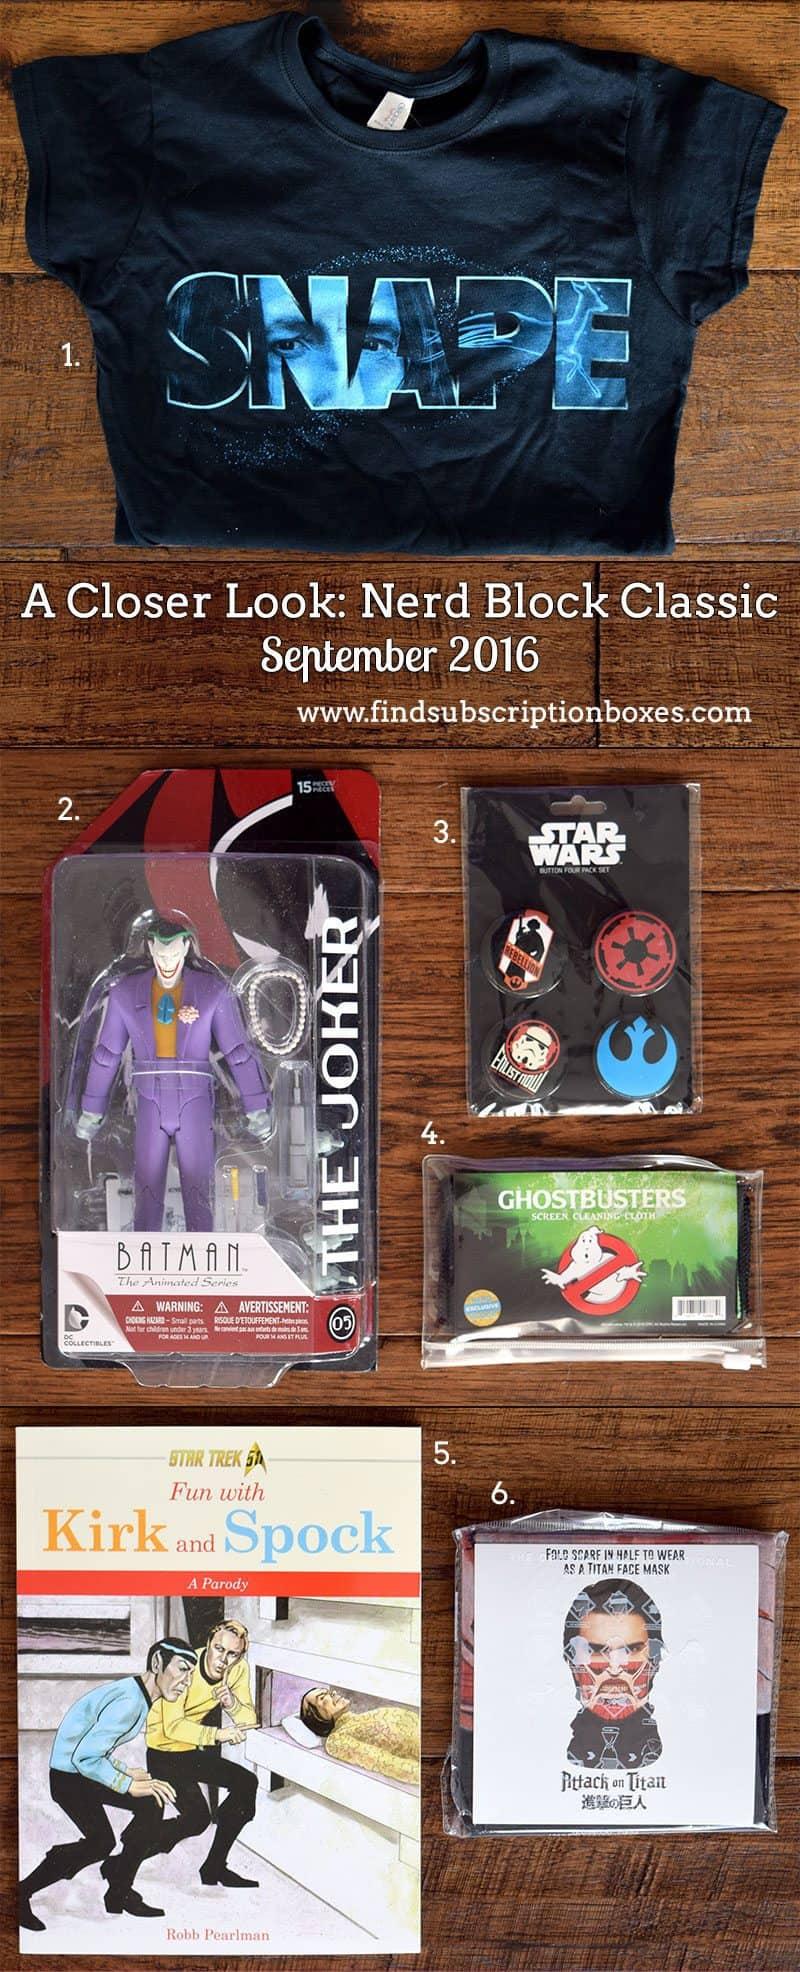 September 2016 Nerd Block Classic Review - Inside the Box